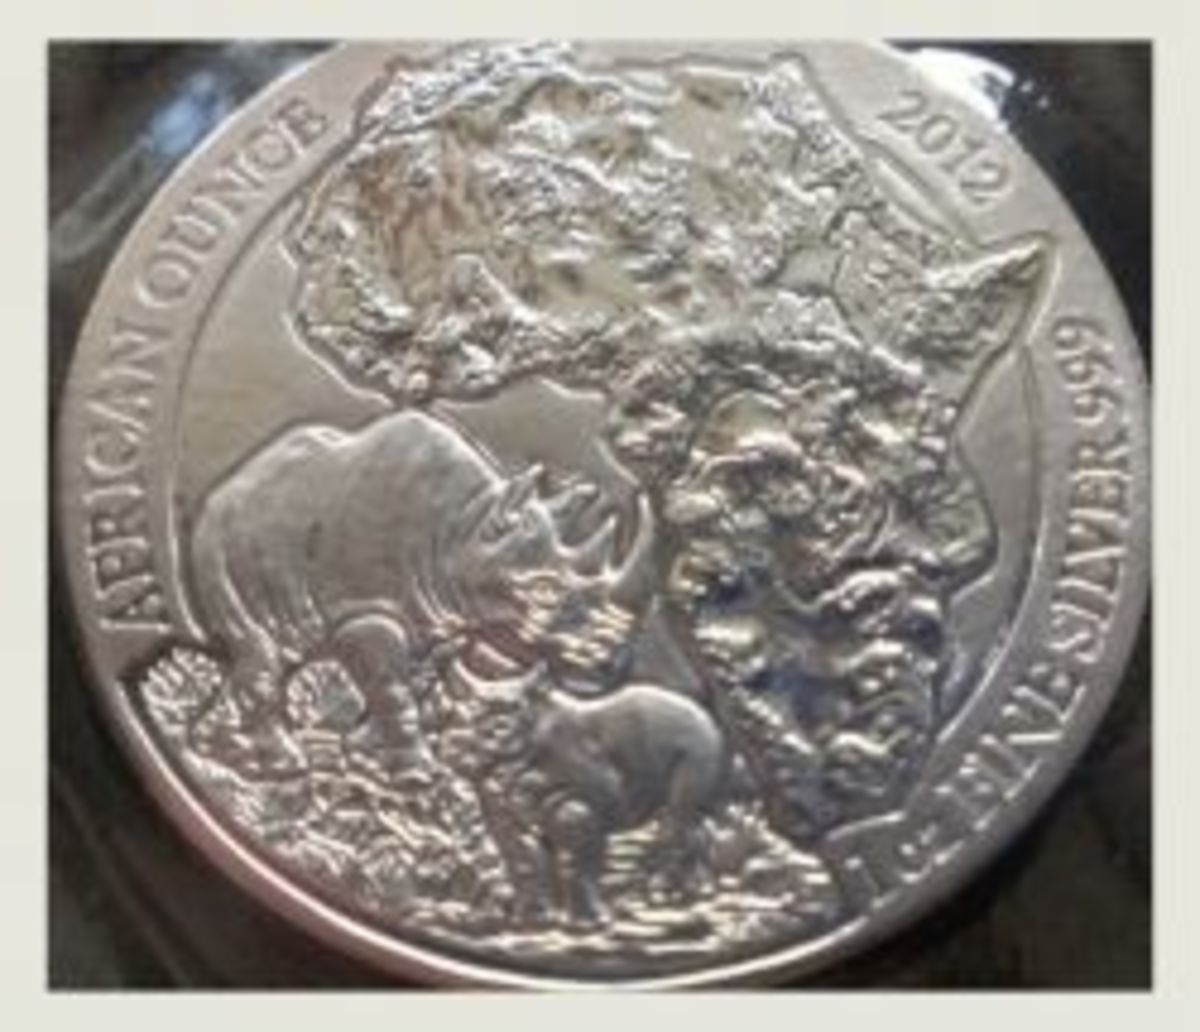 2012 Rwanda Silver Rhino Silver Coin